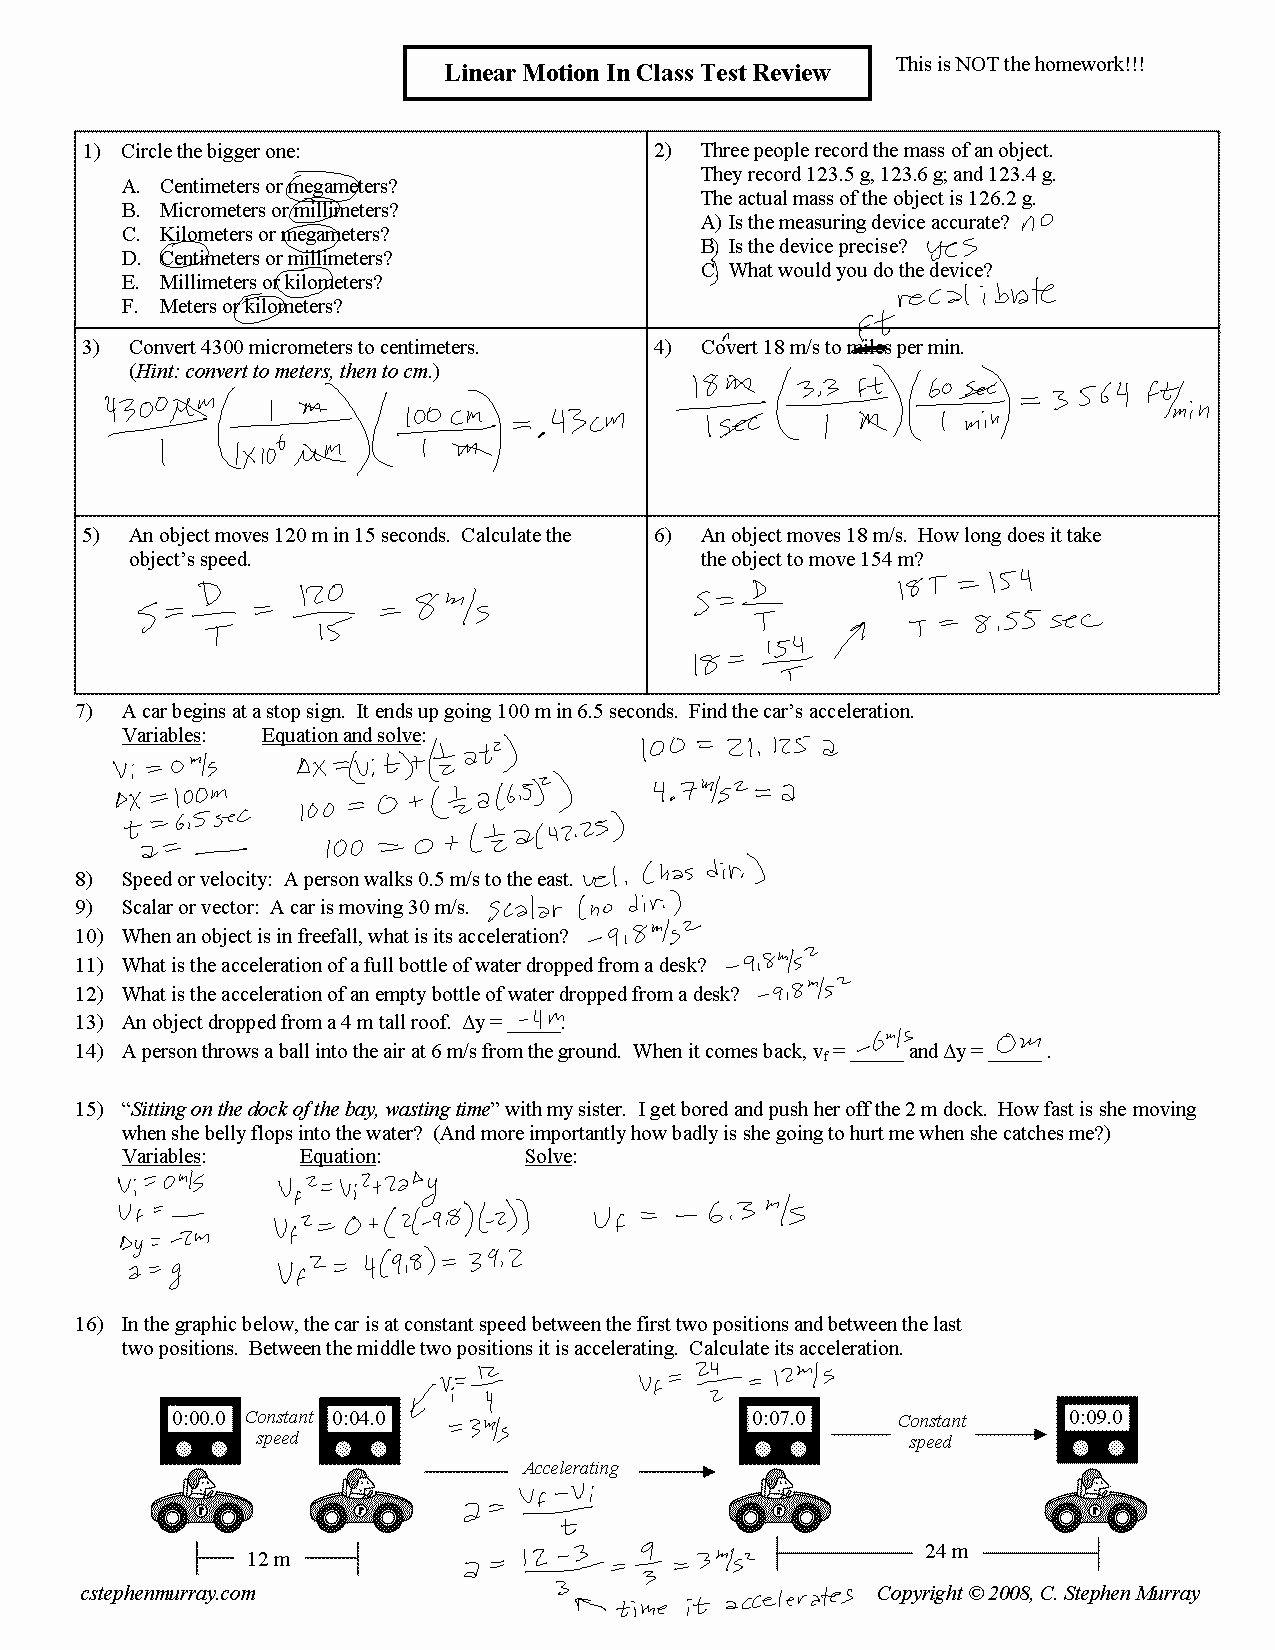 Kinematics Practice Problems Worksheet Unique Kinematic